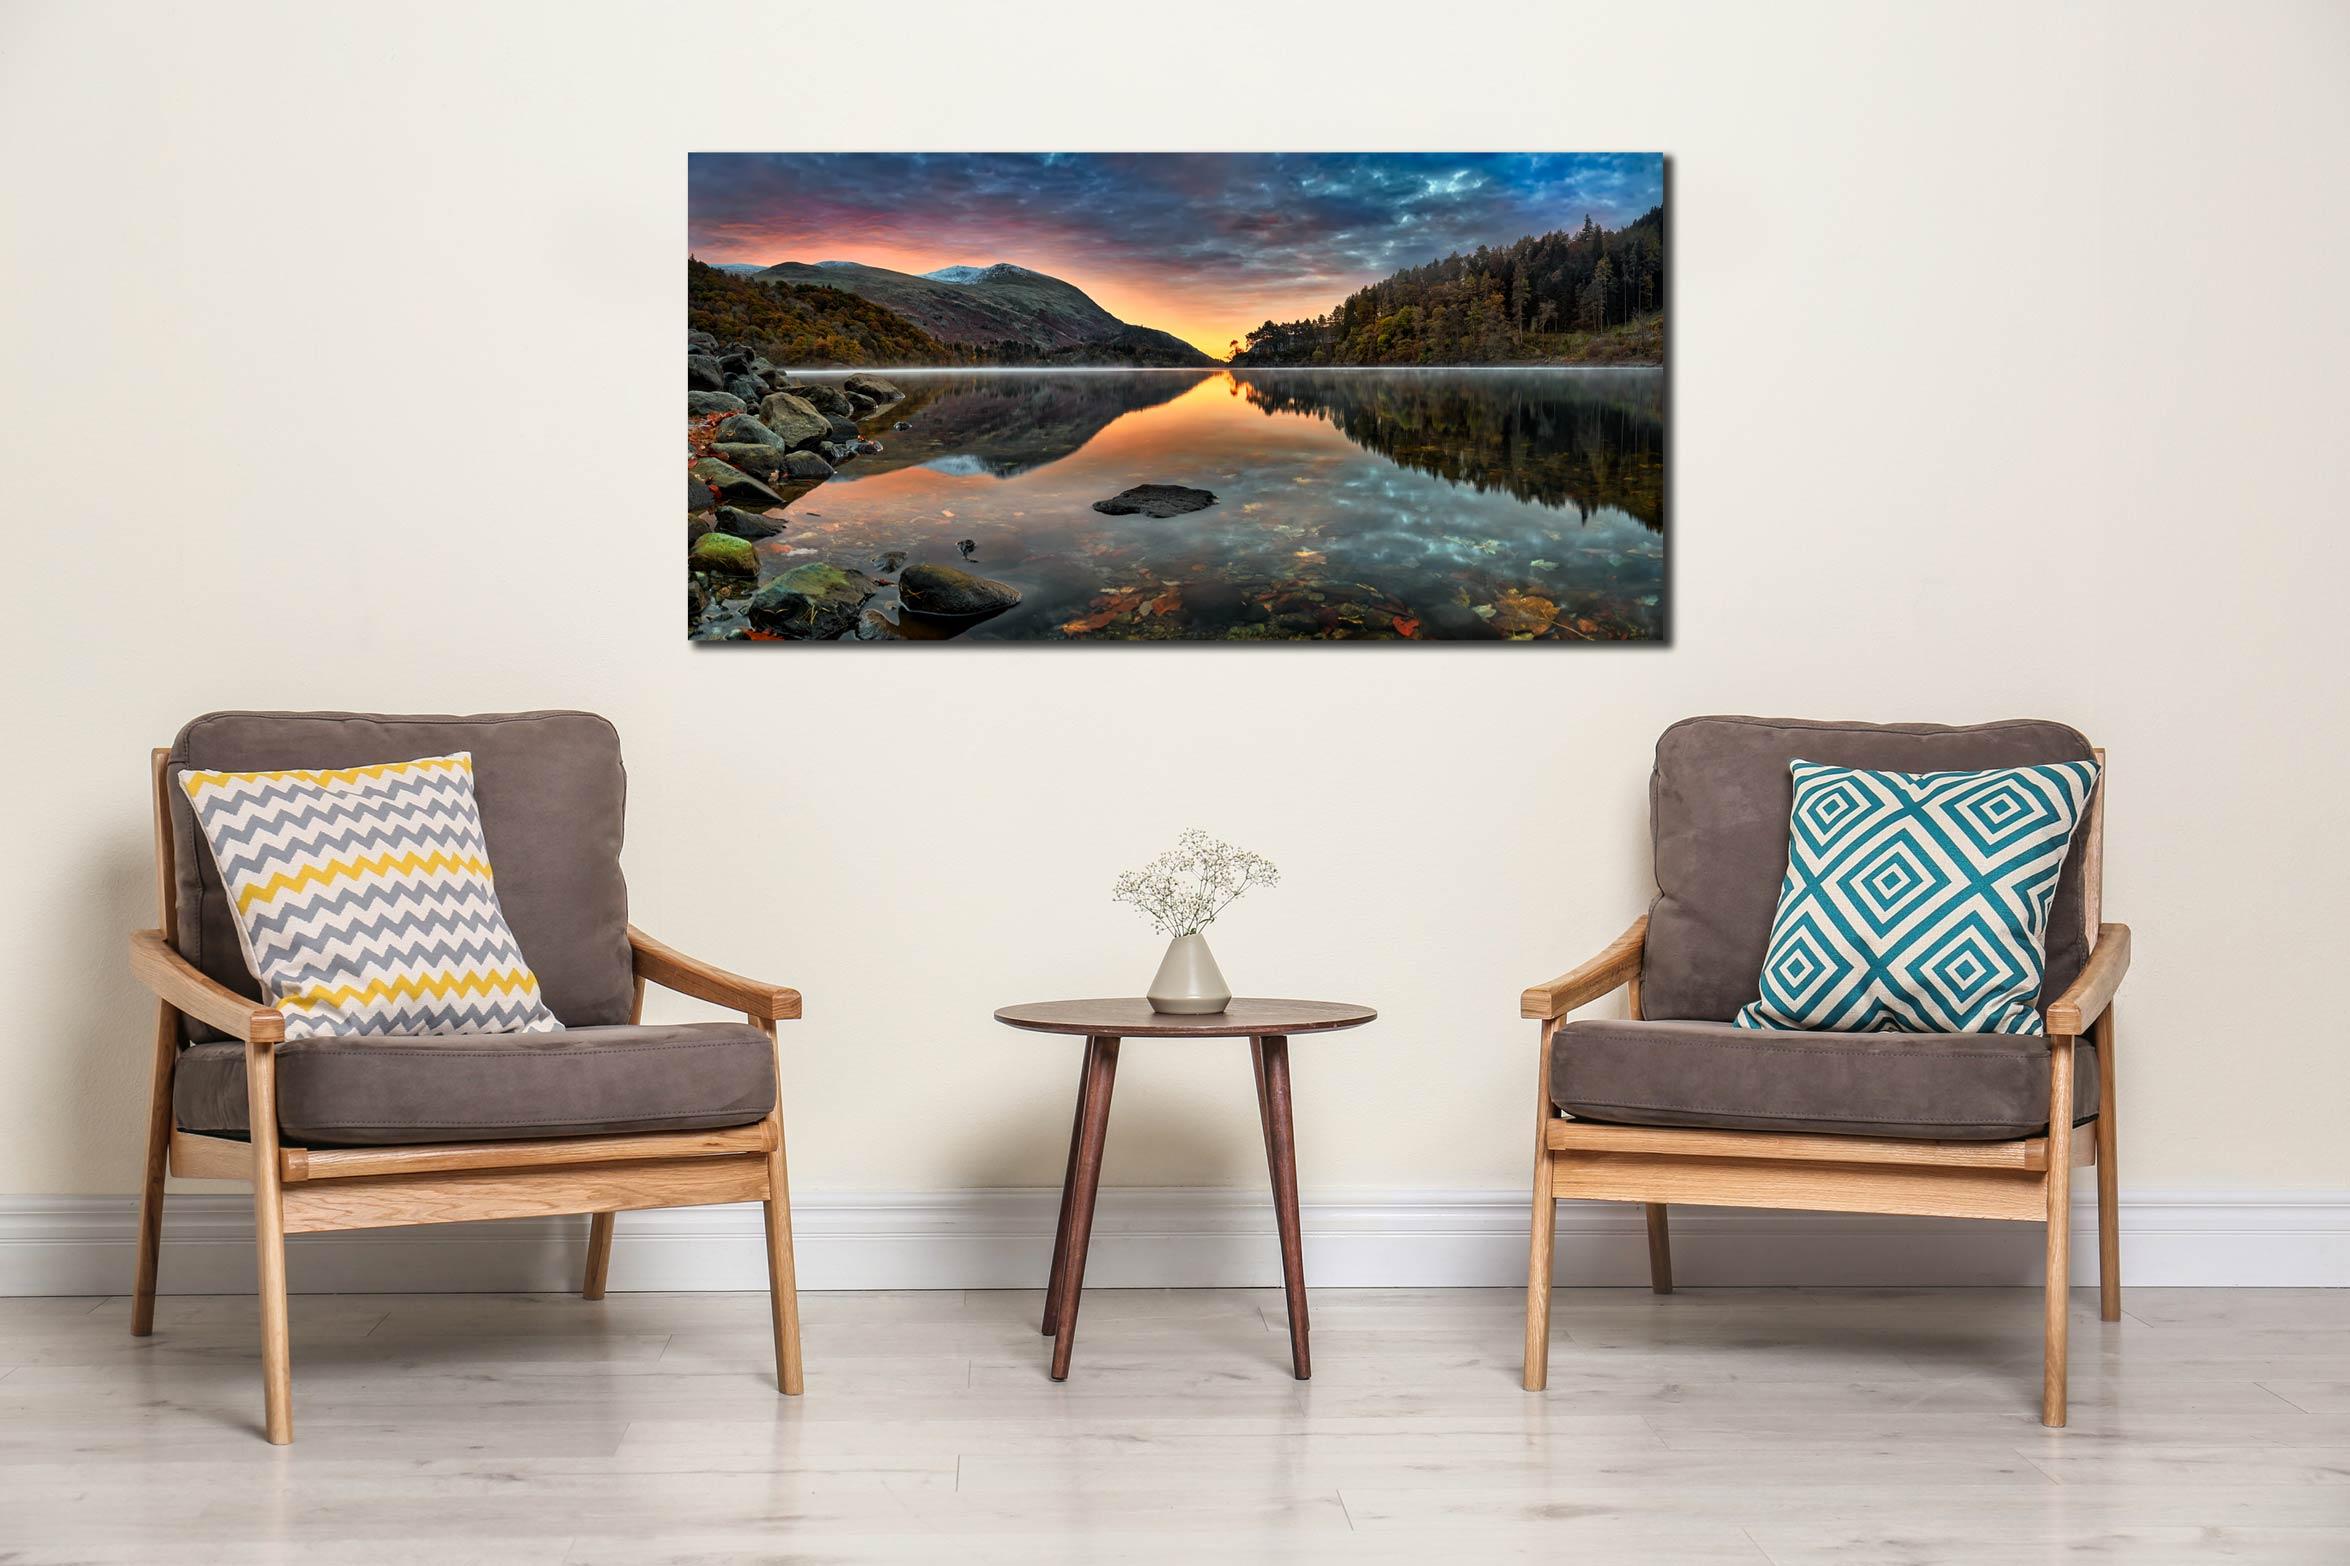 Thirlmere Autumn Dawn - Canvas Print on Wall